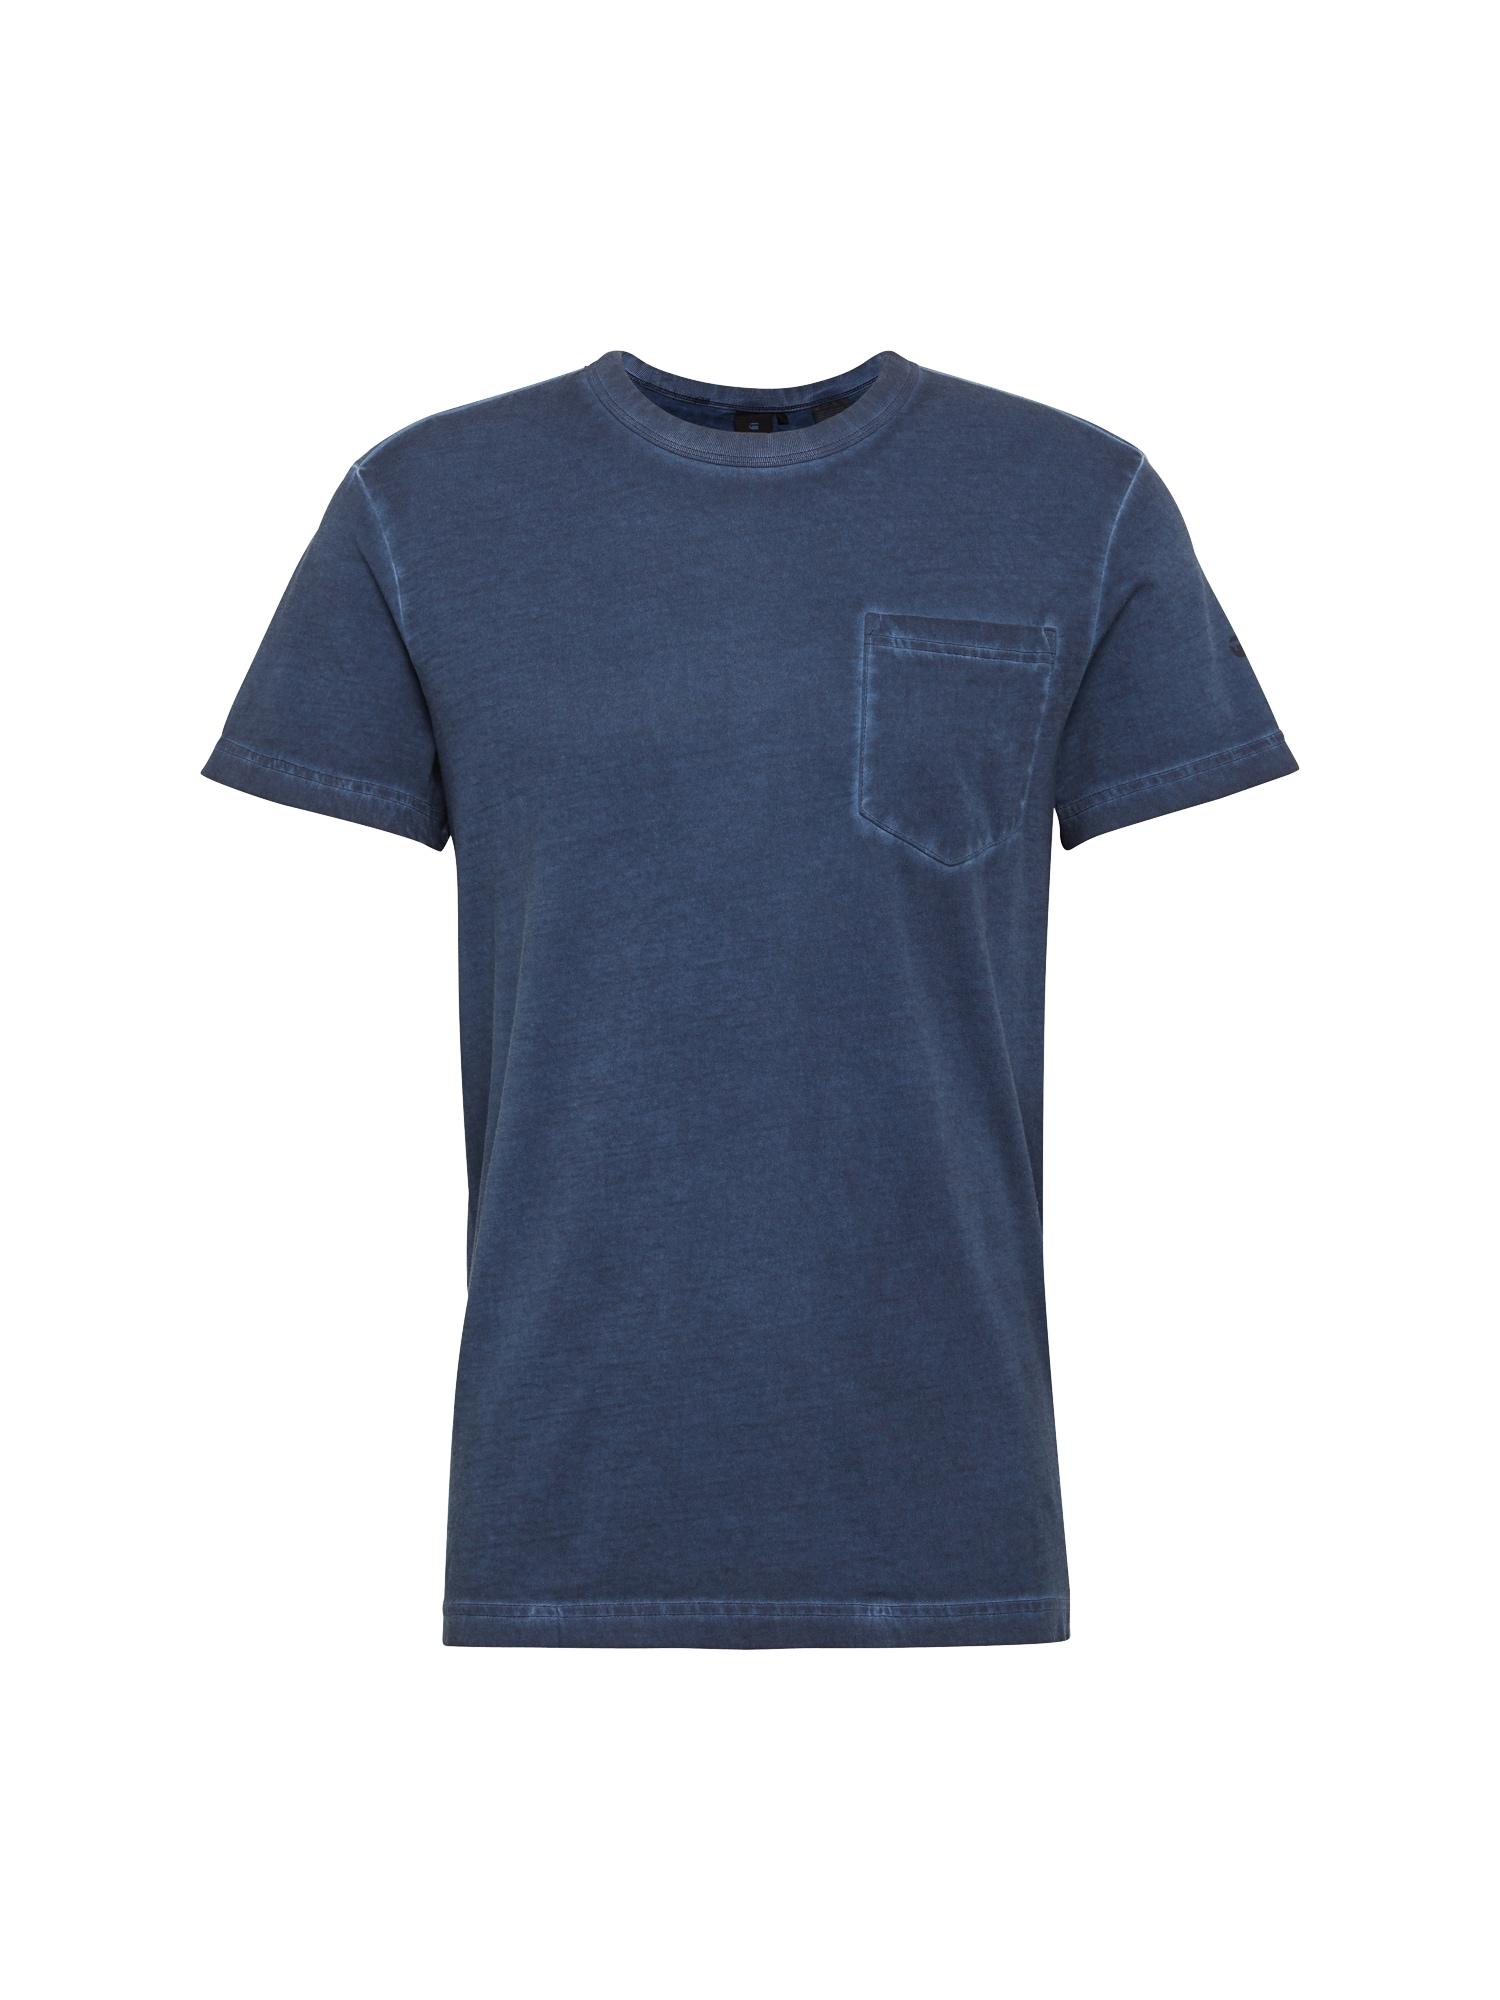 G-STAR RAW Heren Shirt Dill pocket r t s s donkerblauw